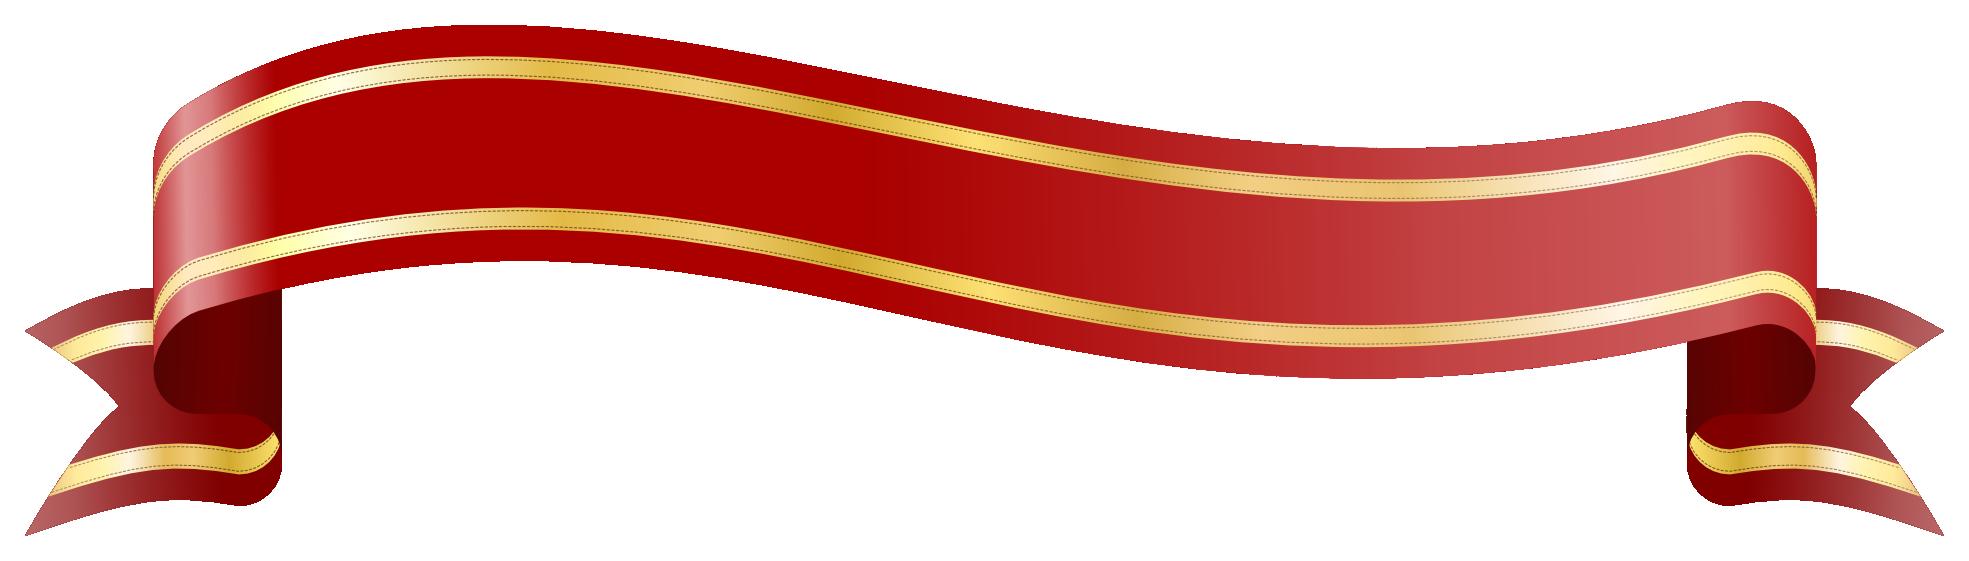 Ribbon Png Image - Ribbon, Transparent background PNG HD thumbnail